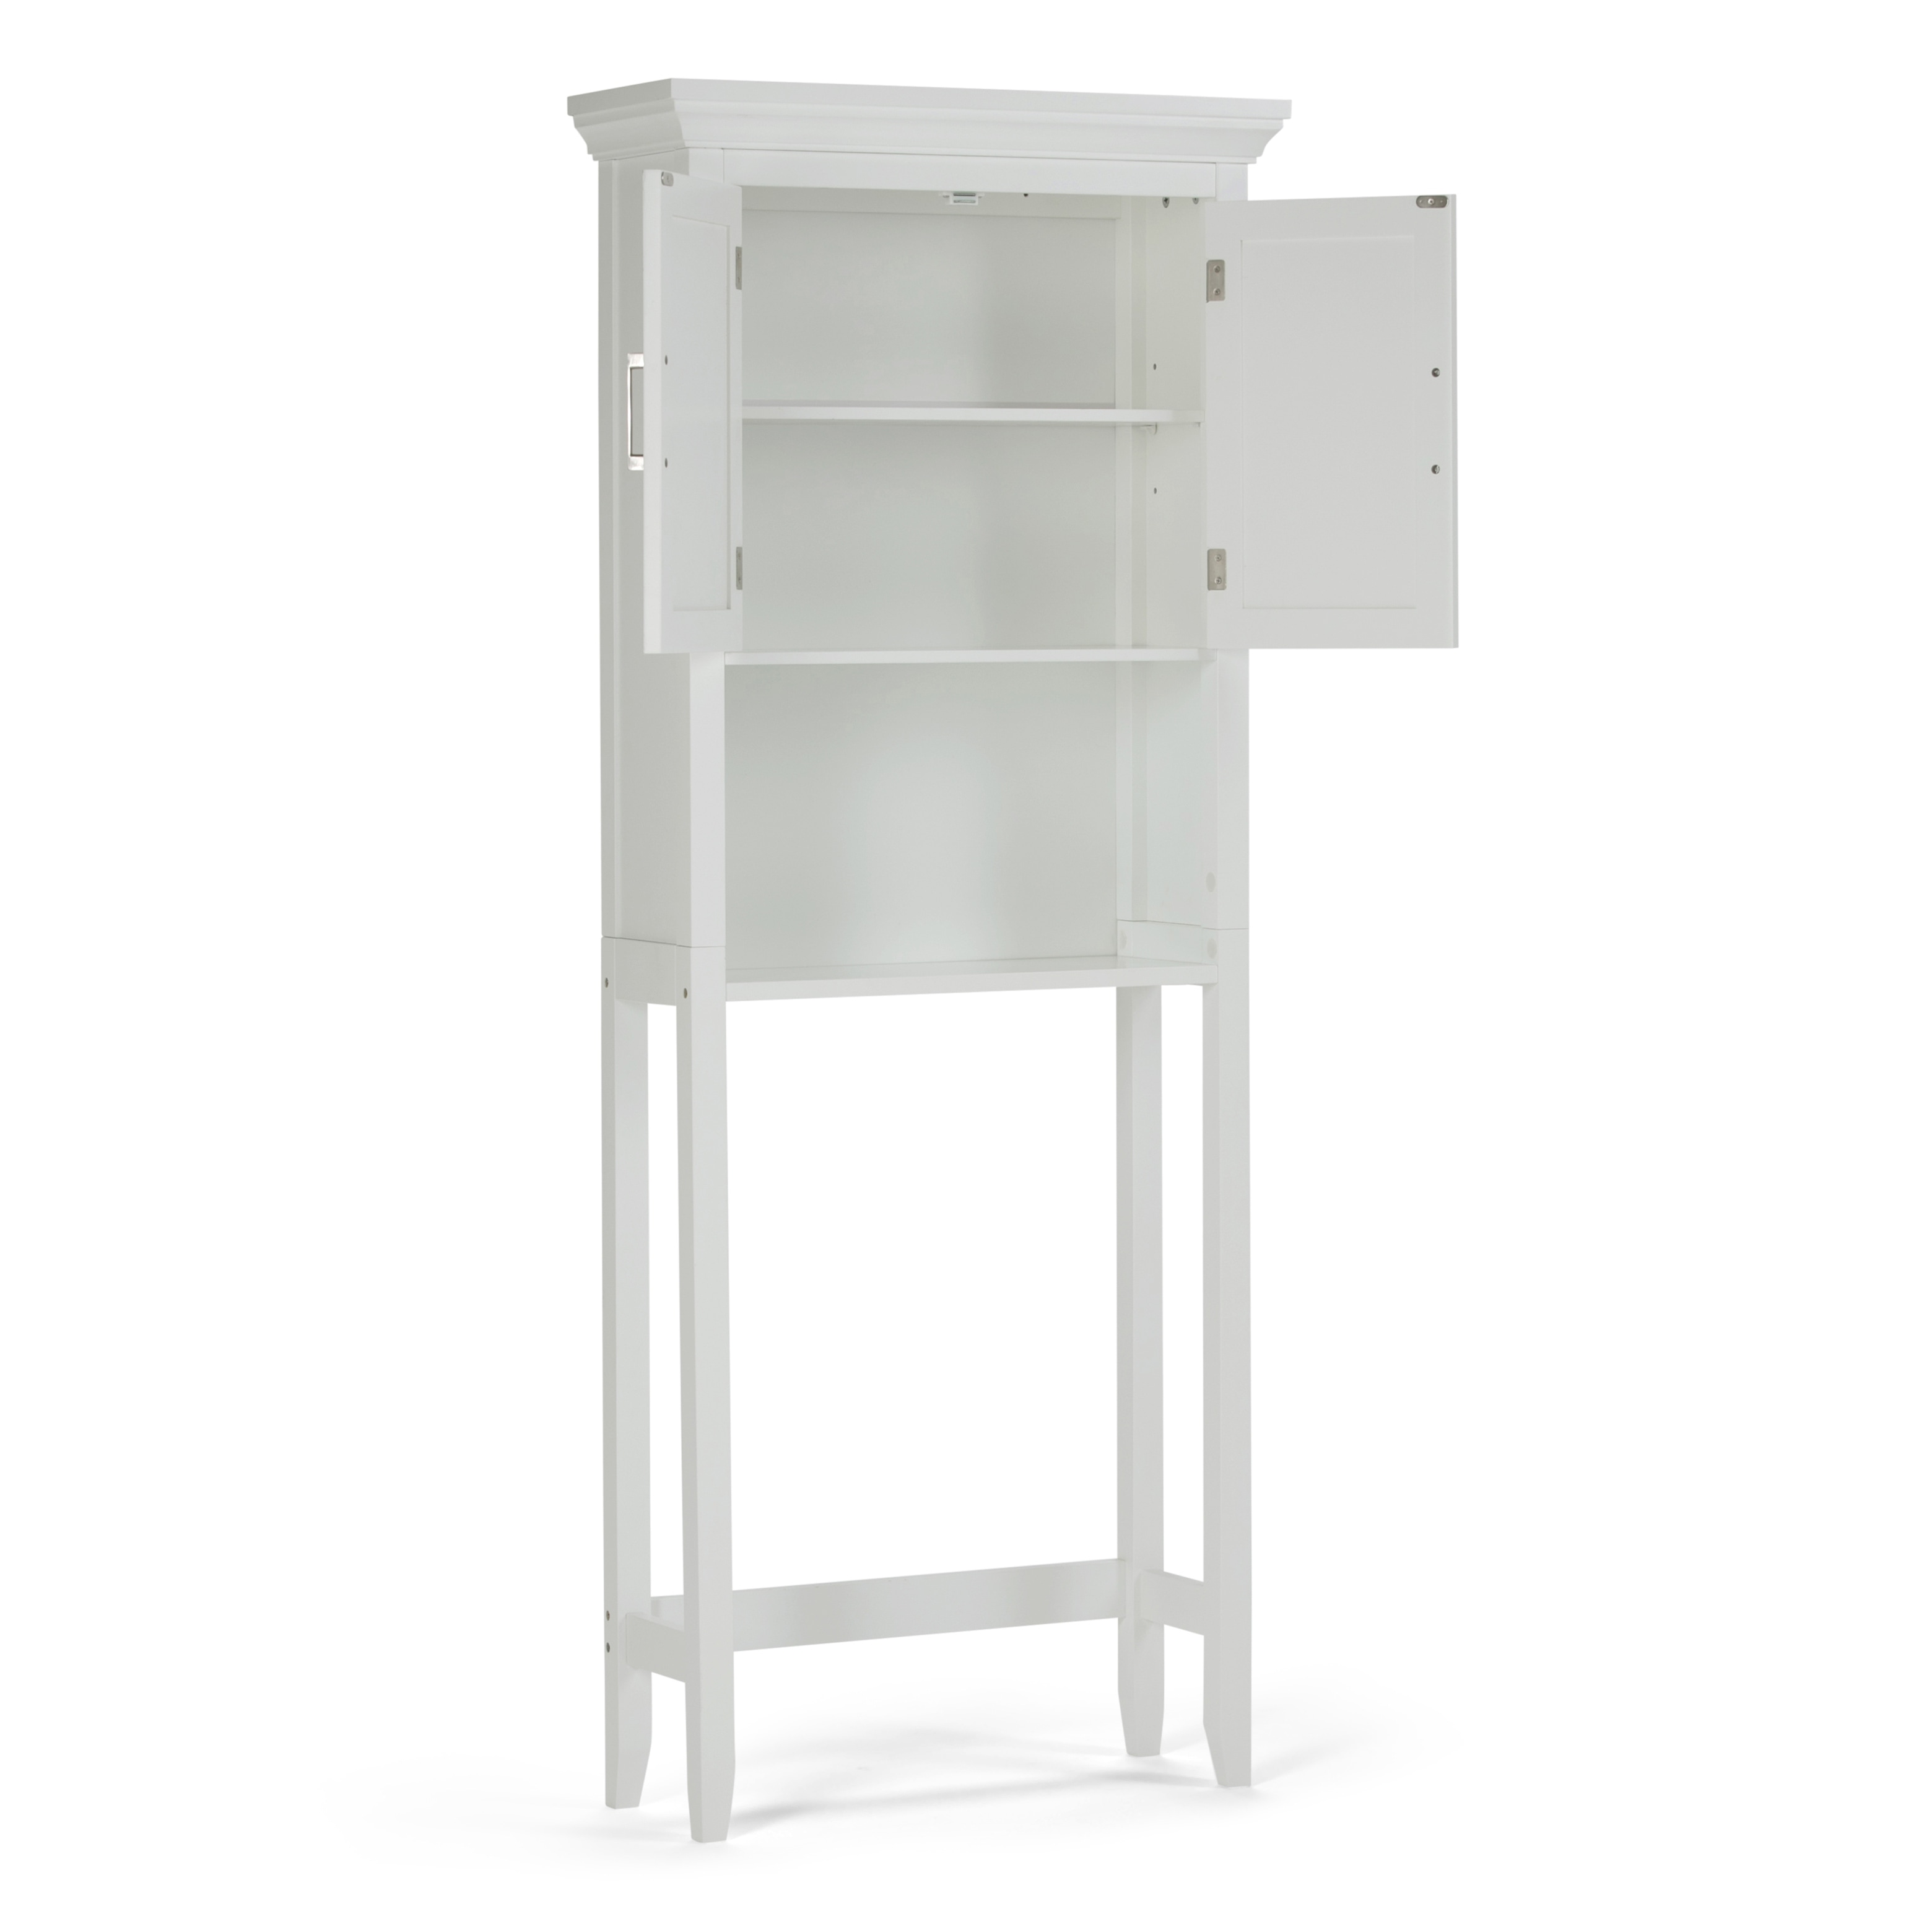 Shop WYNDENHALL Hayes White Bathroom Space Saver Cabinet Free - Wyndenhall hayes white bathroom space saver cabinet